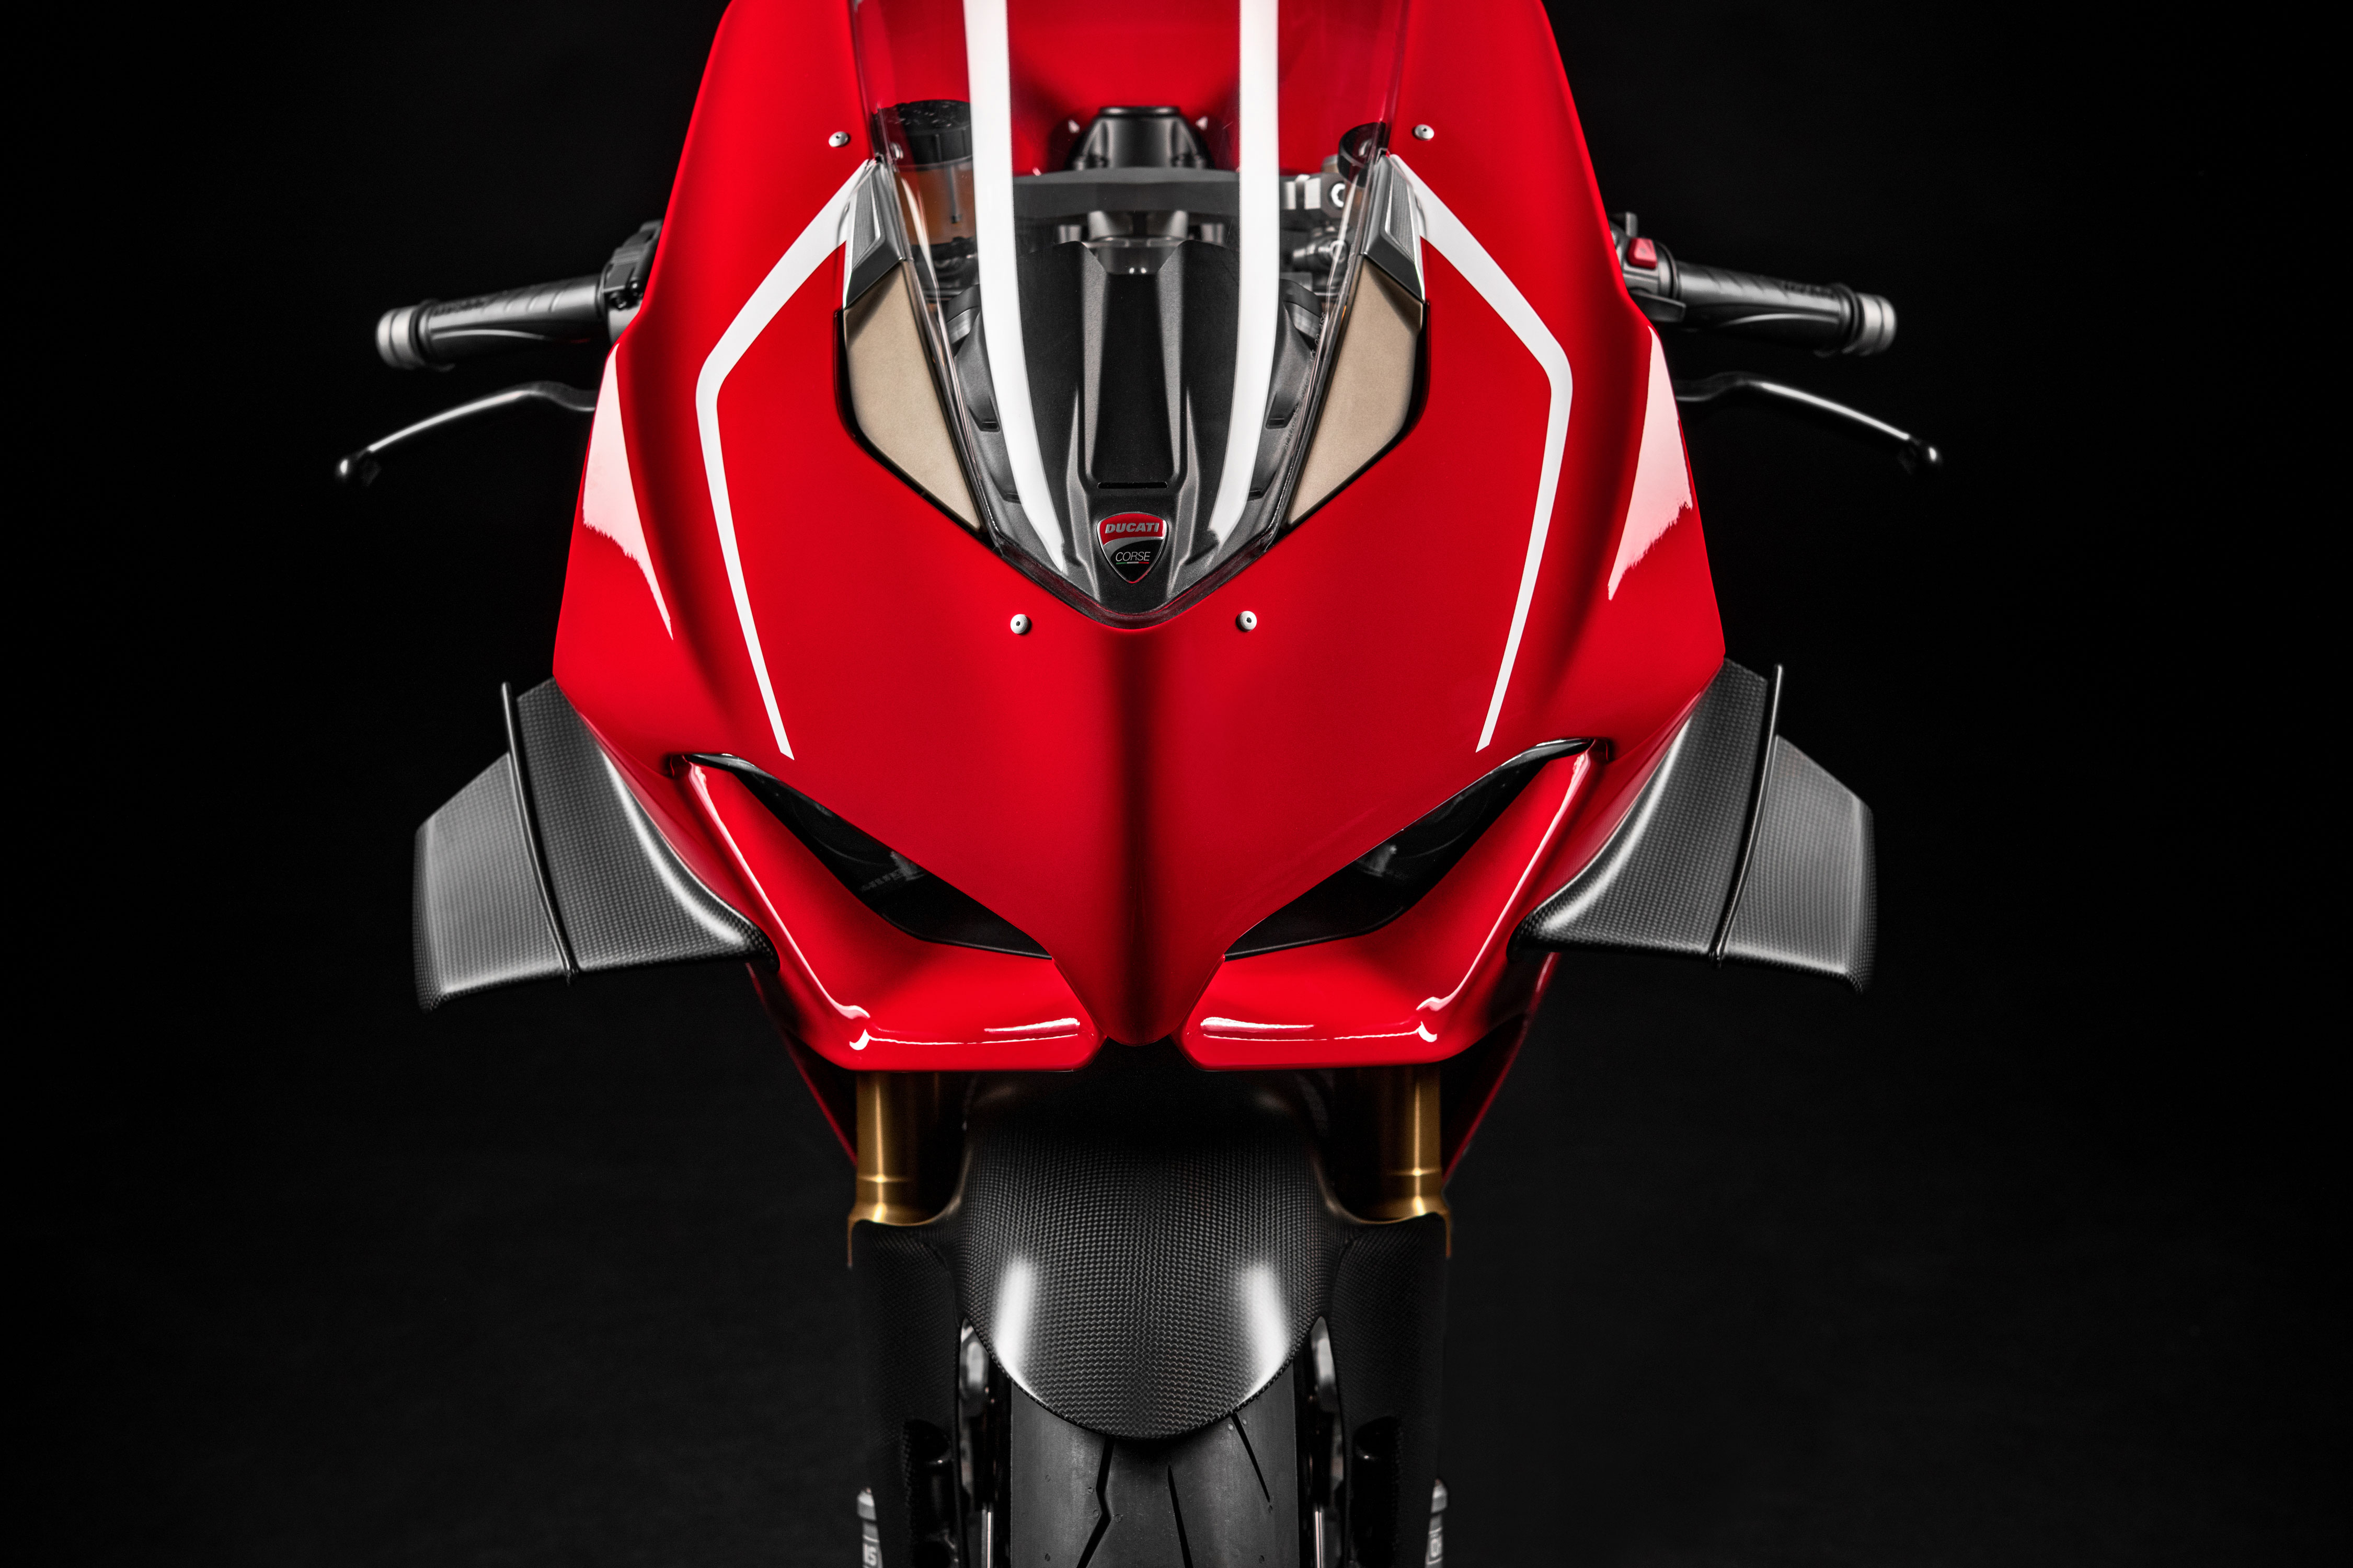 Aerodinamična krilca V4R Ducati